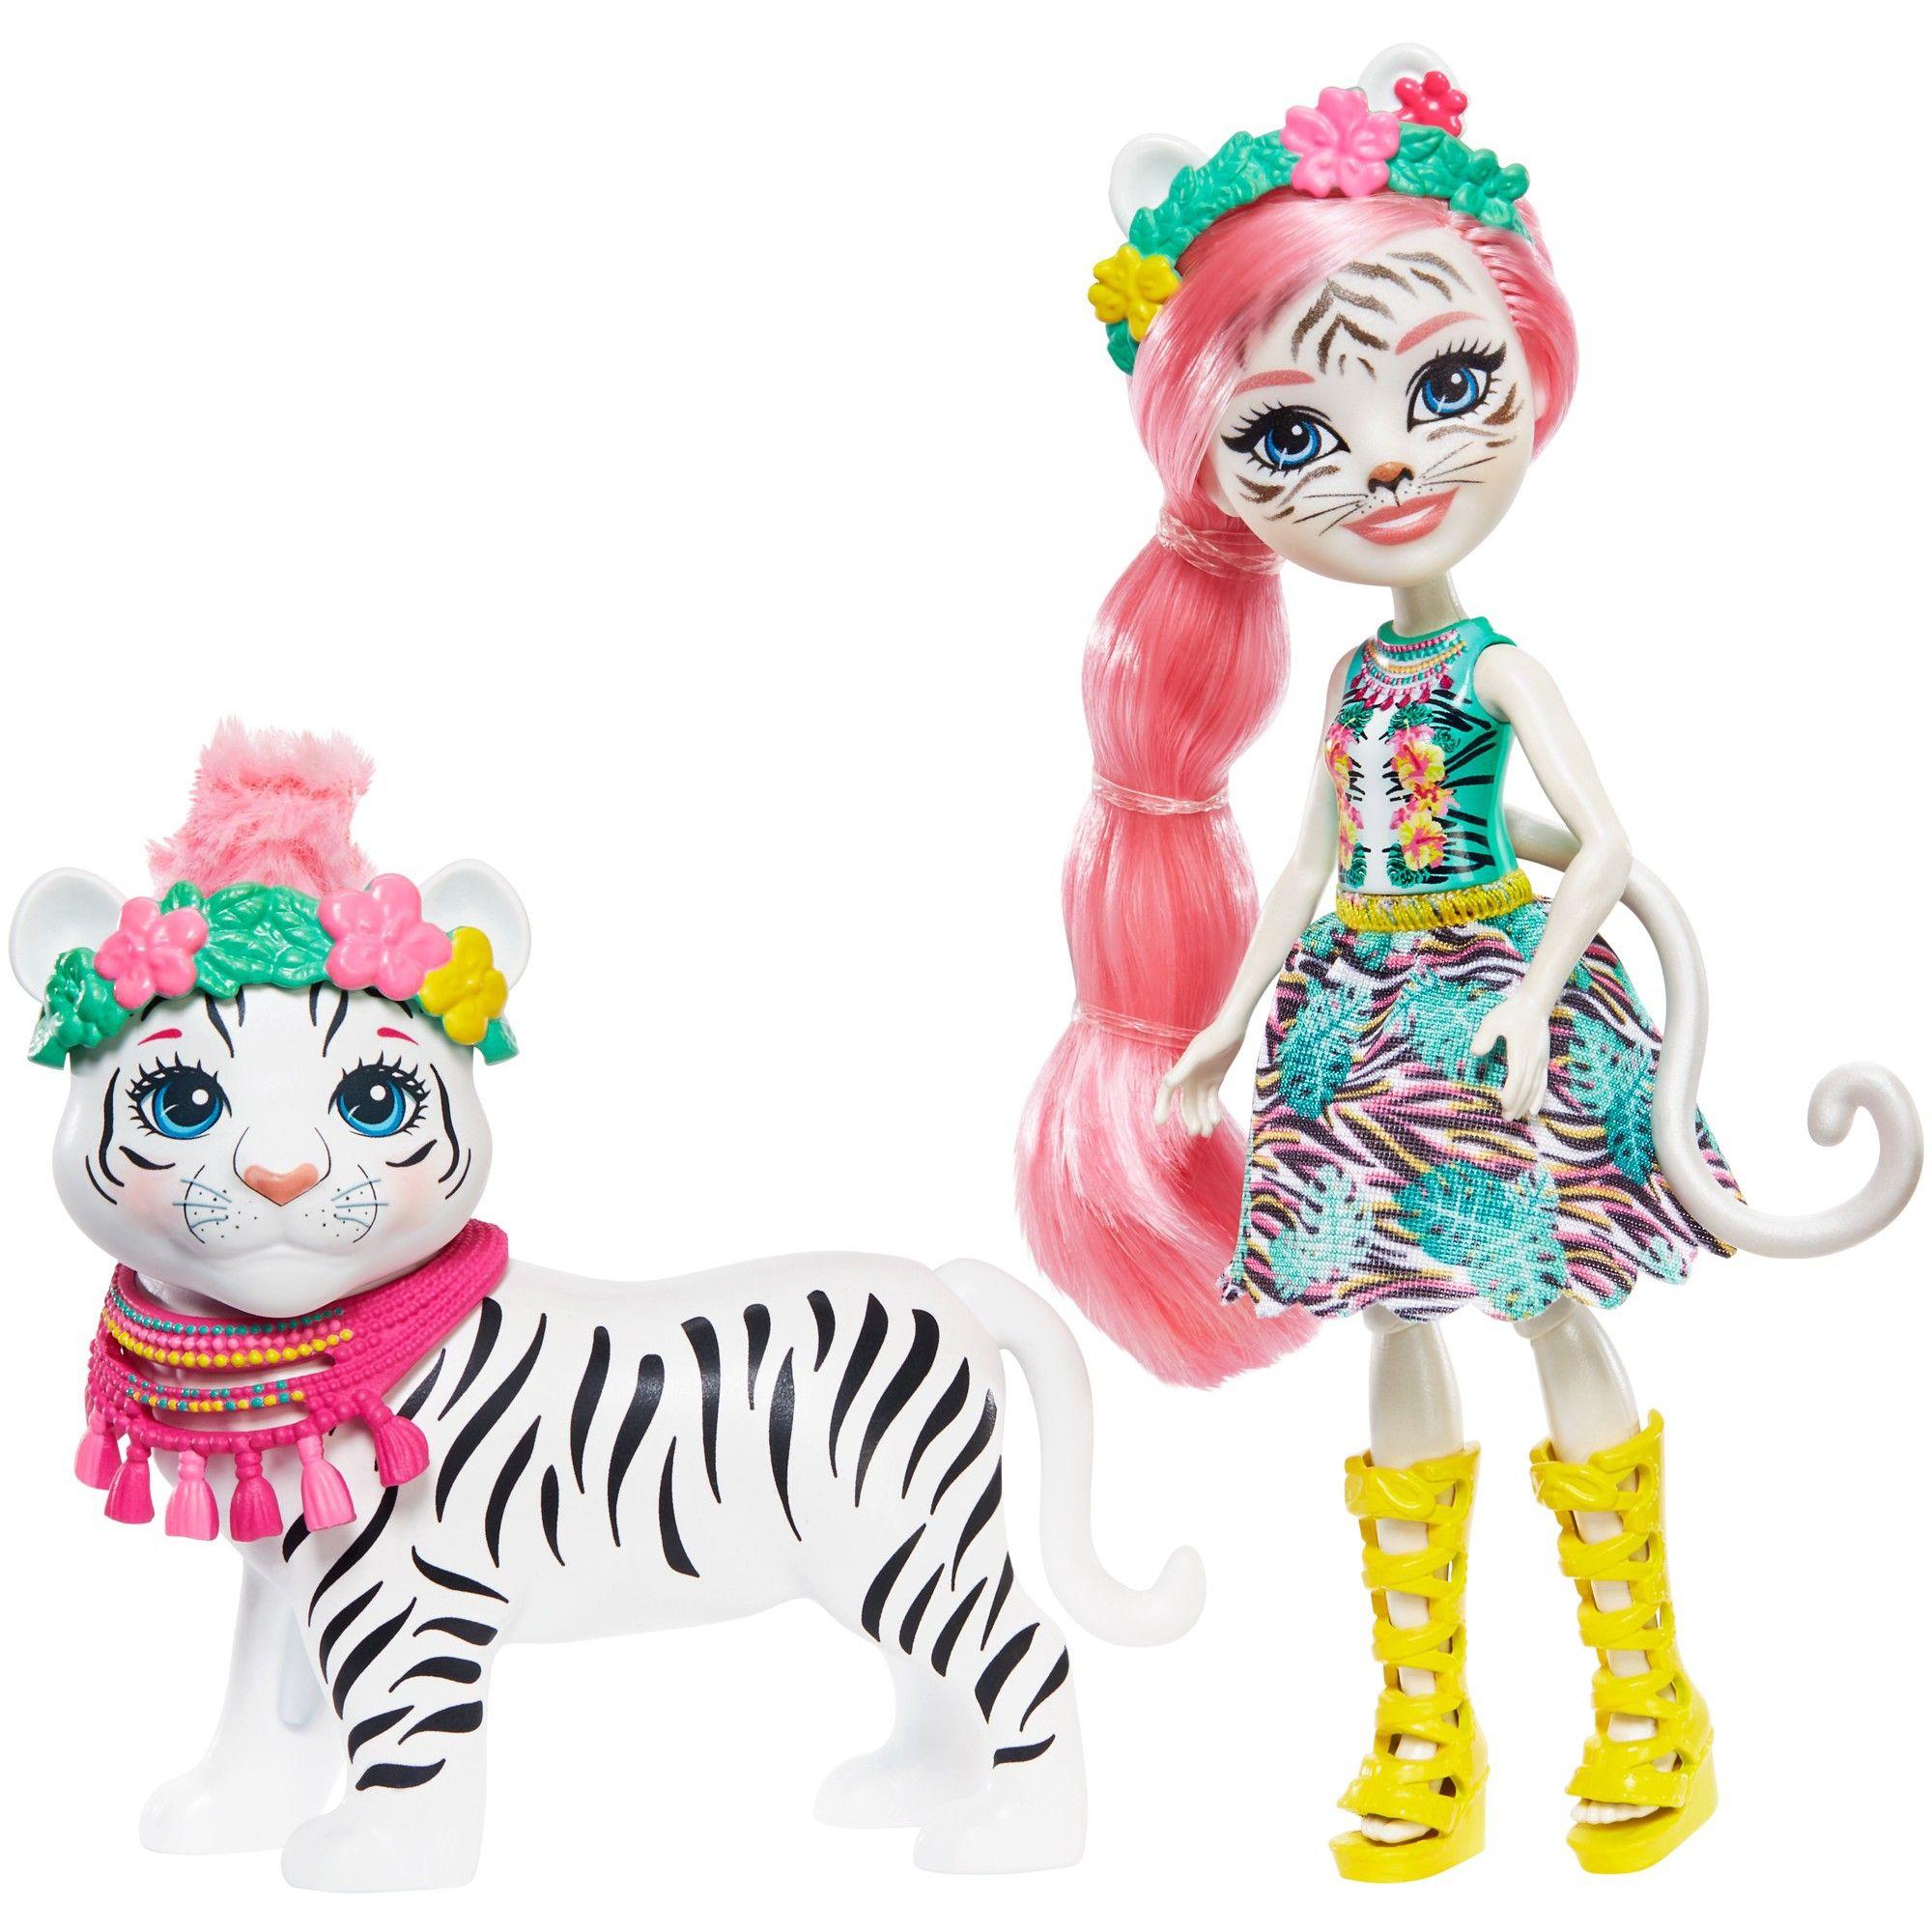 Enchantimals Tadley Tiger Kitty Dolls Juguetes Mattel Juguetes Para Ninas Ninos De La Calle